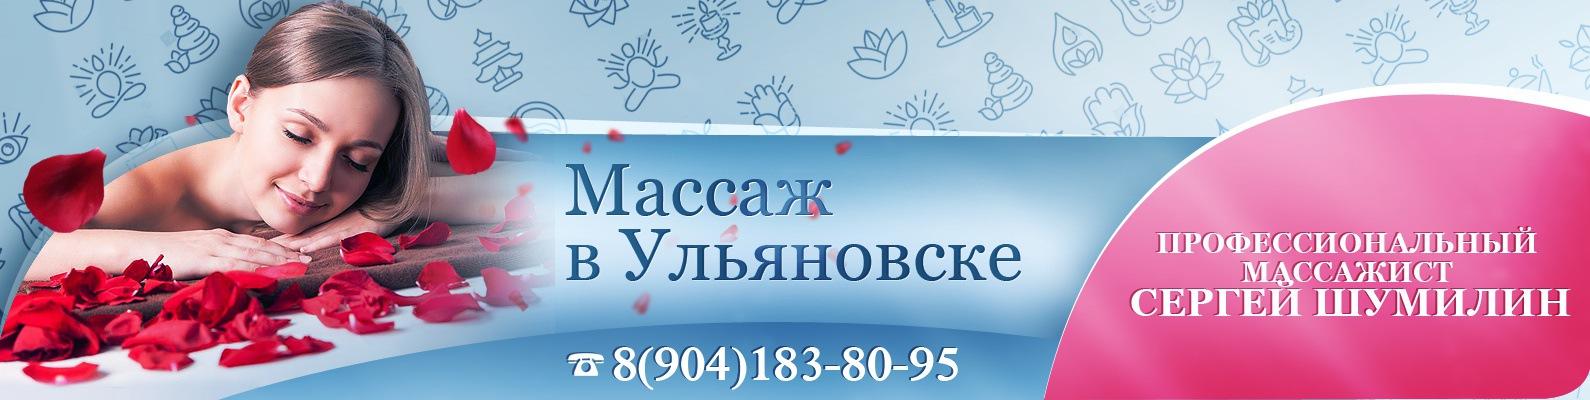 massazh-v-dome-v-ulyanovske-porno